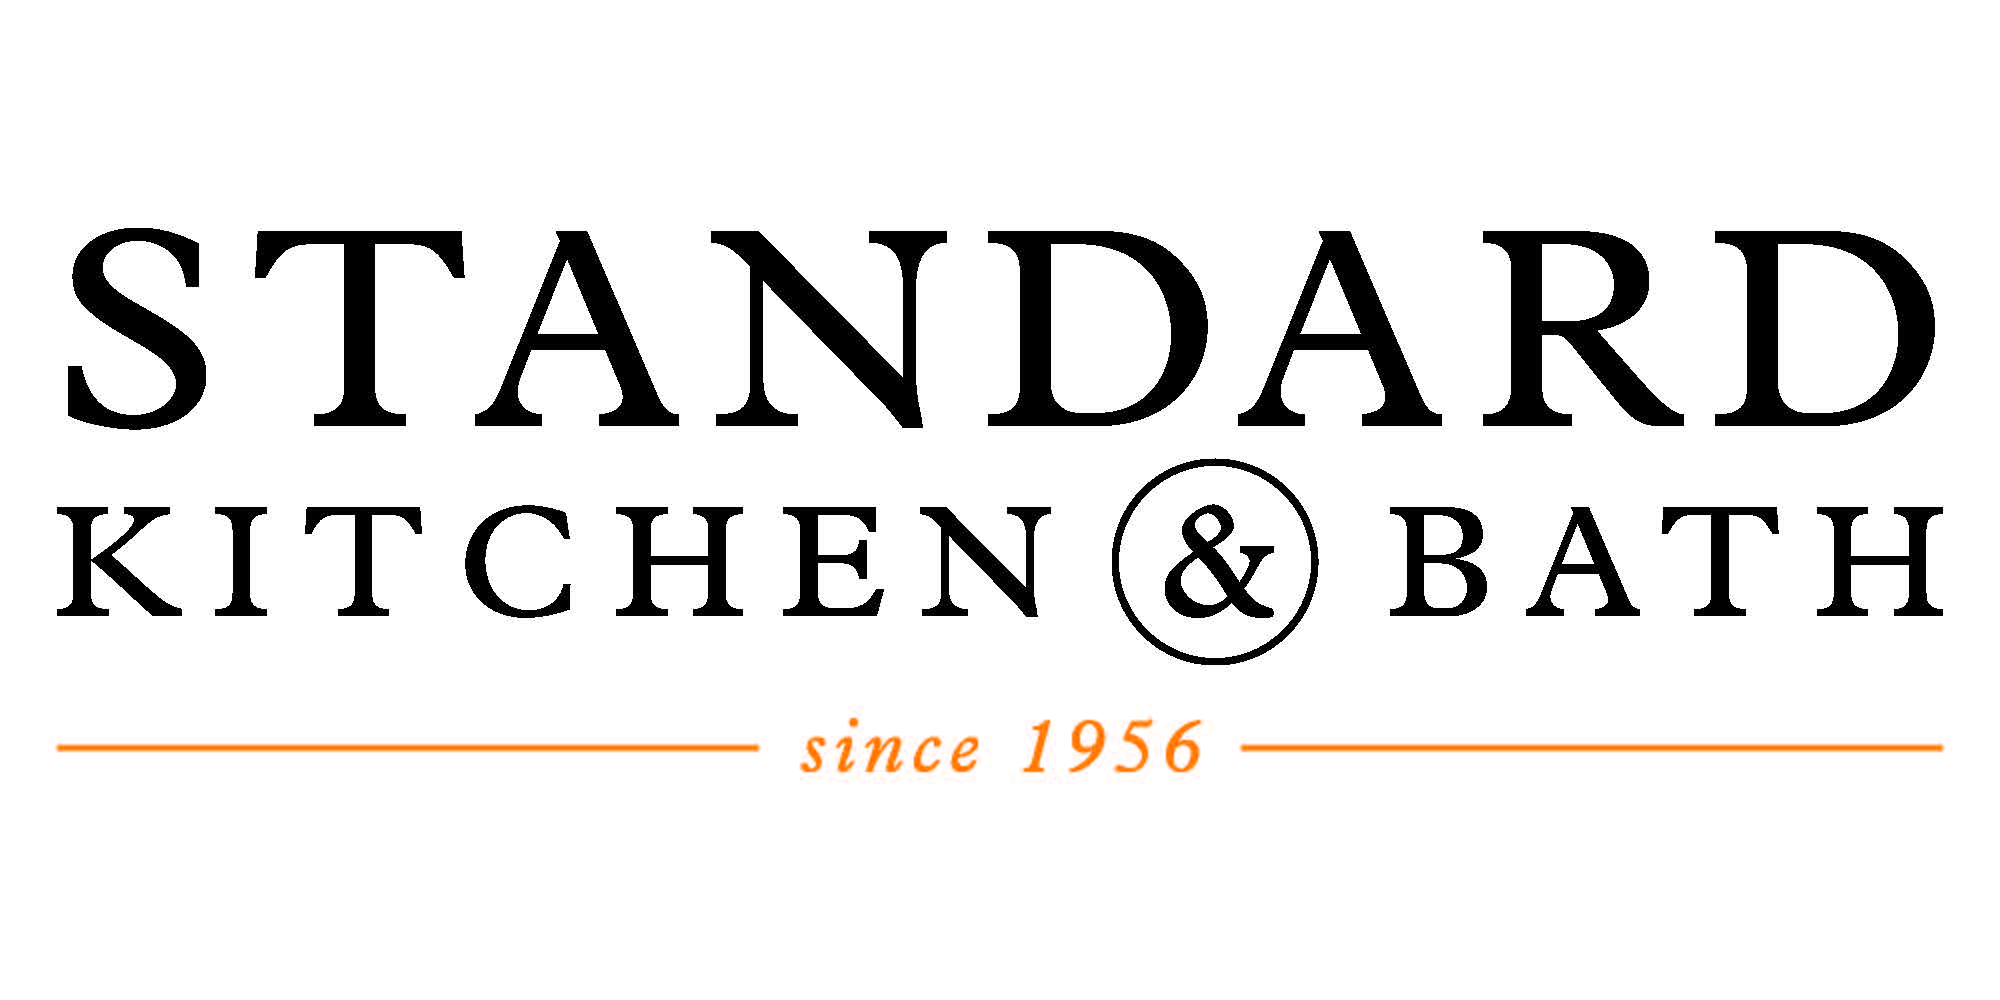 Standard Kitchen & Bath 8719 Kingston Pike, Knoxville, TN ...